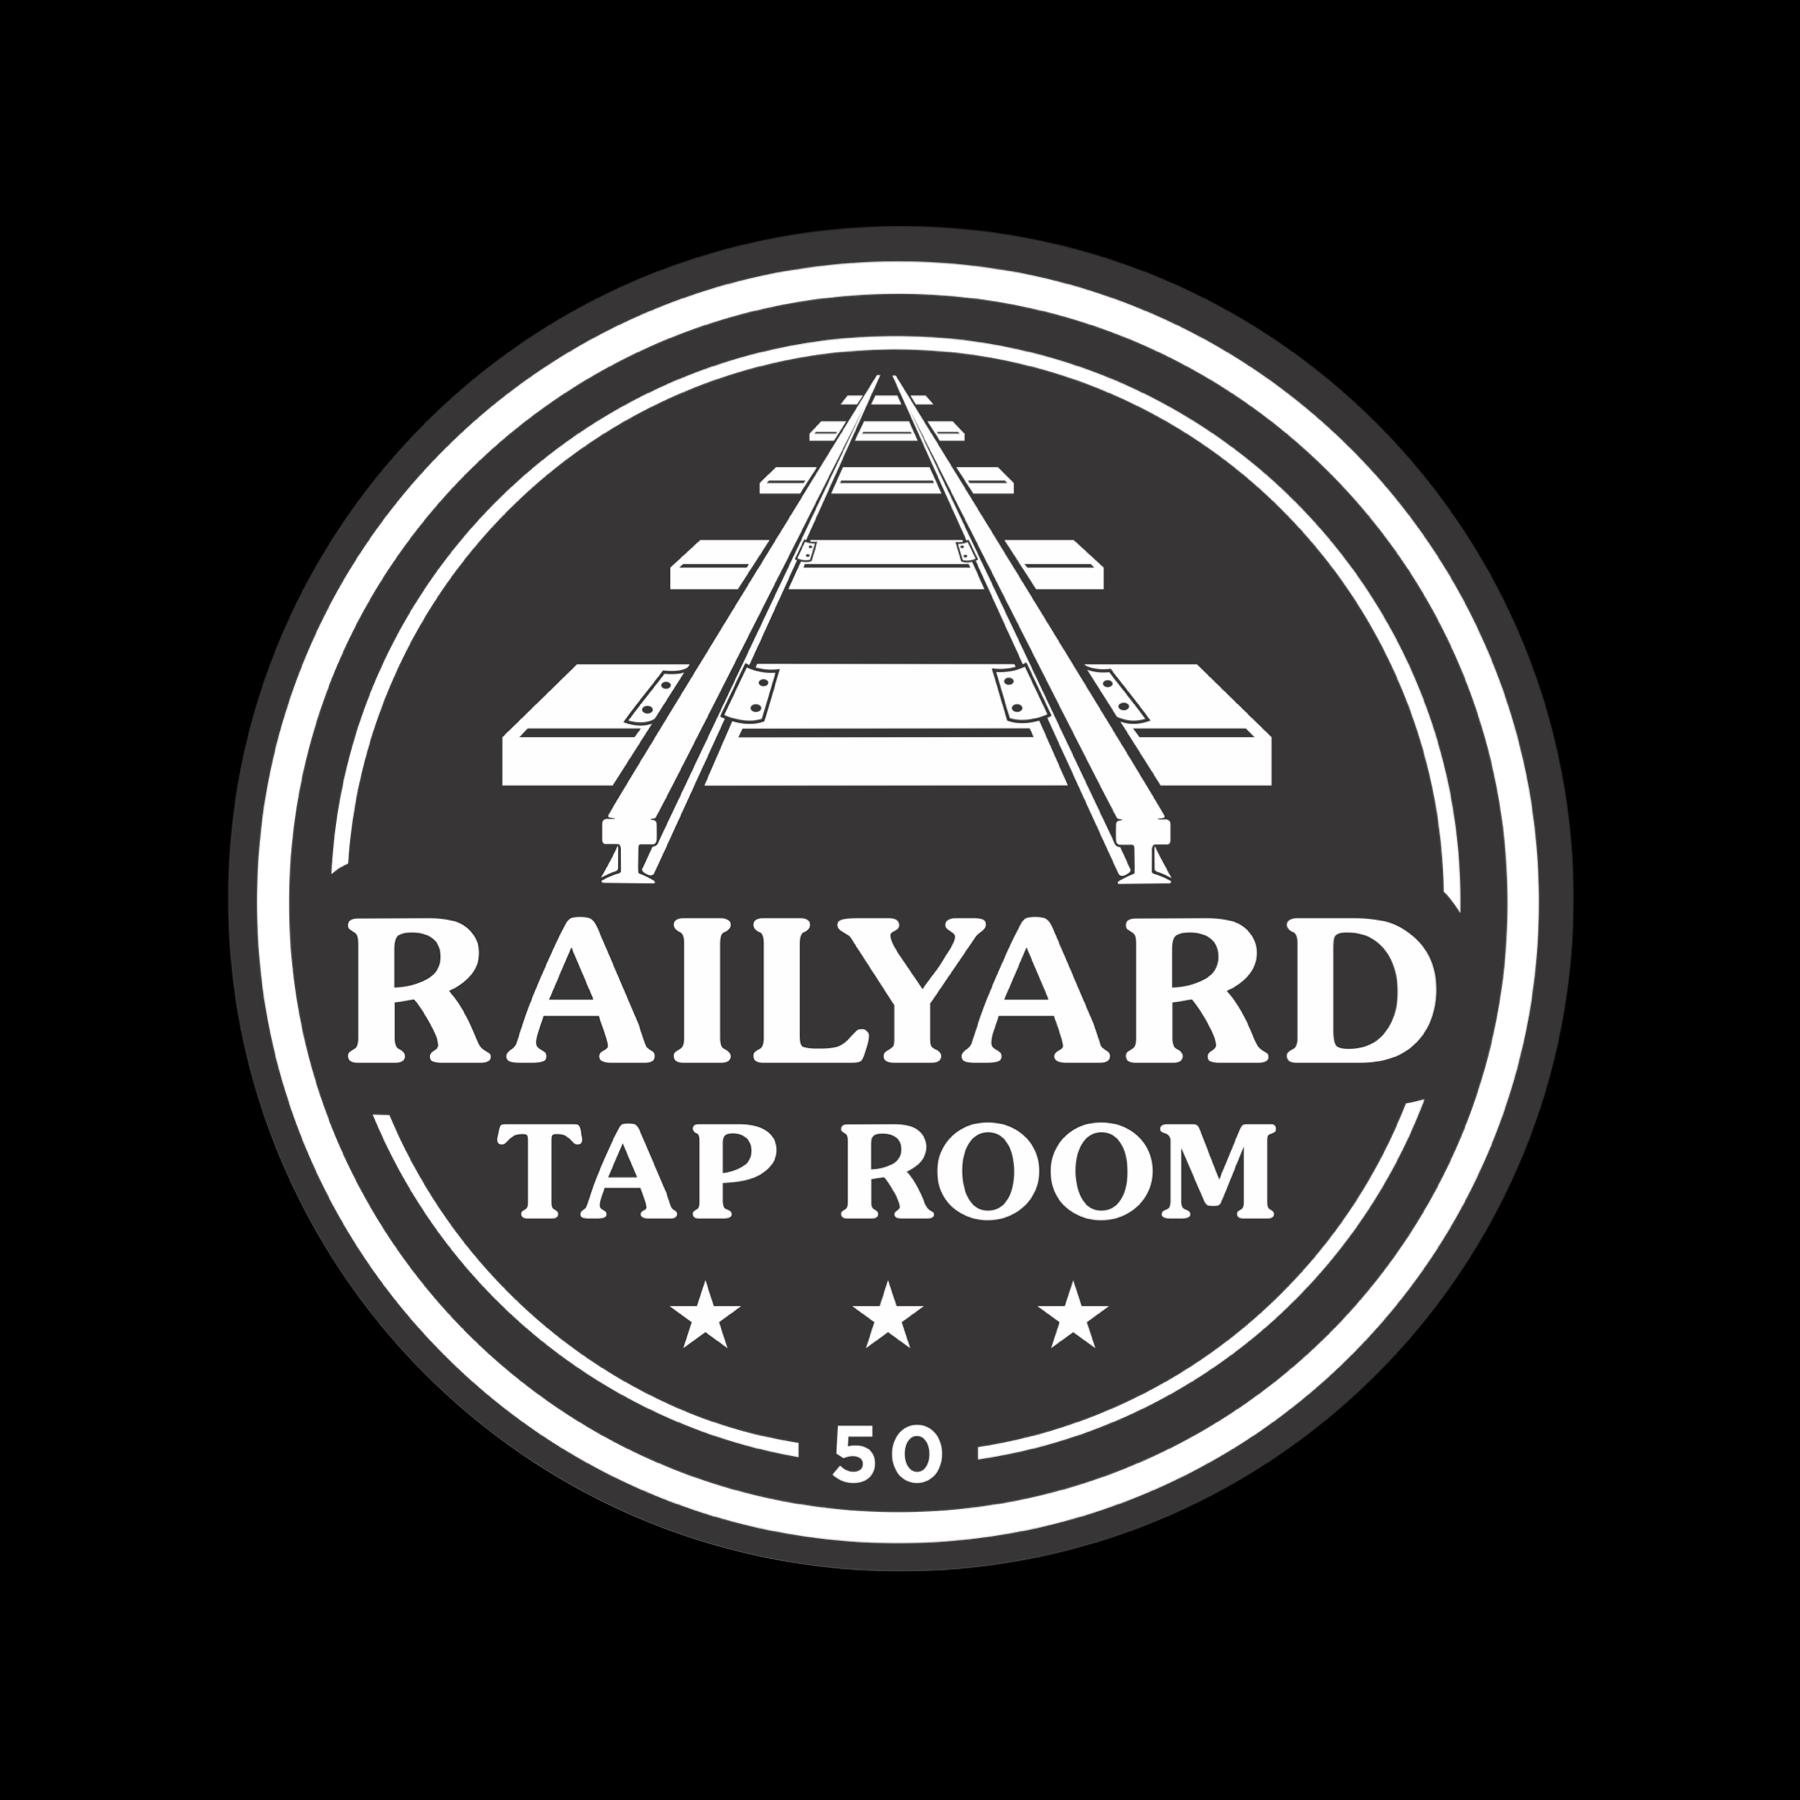 Railyard Grill & Tap Room Logo